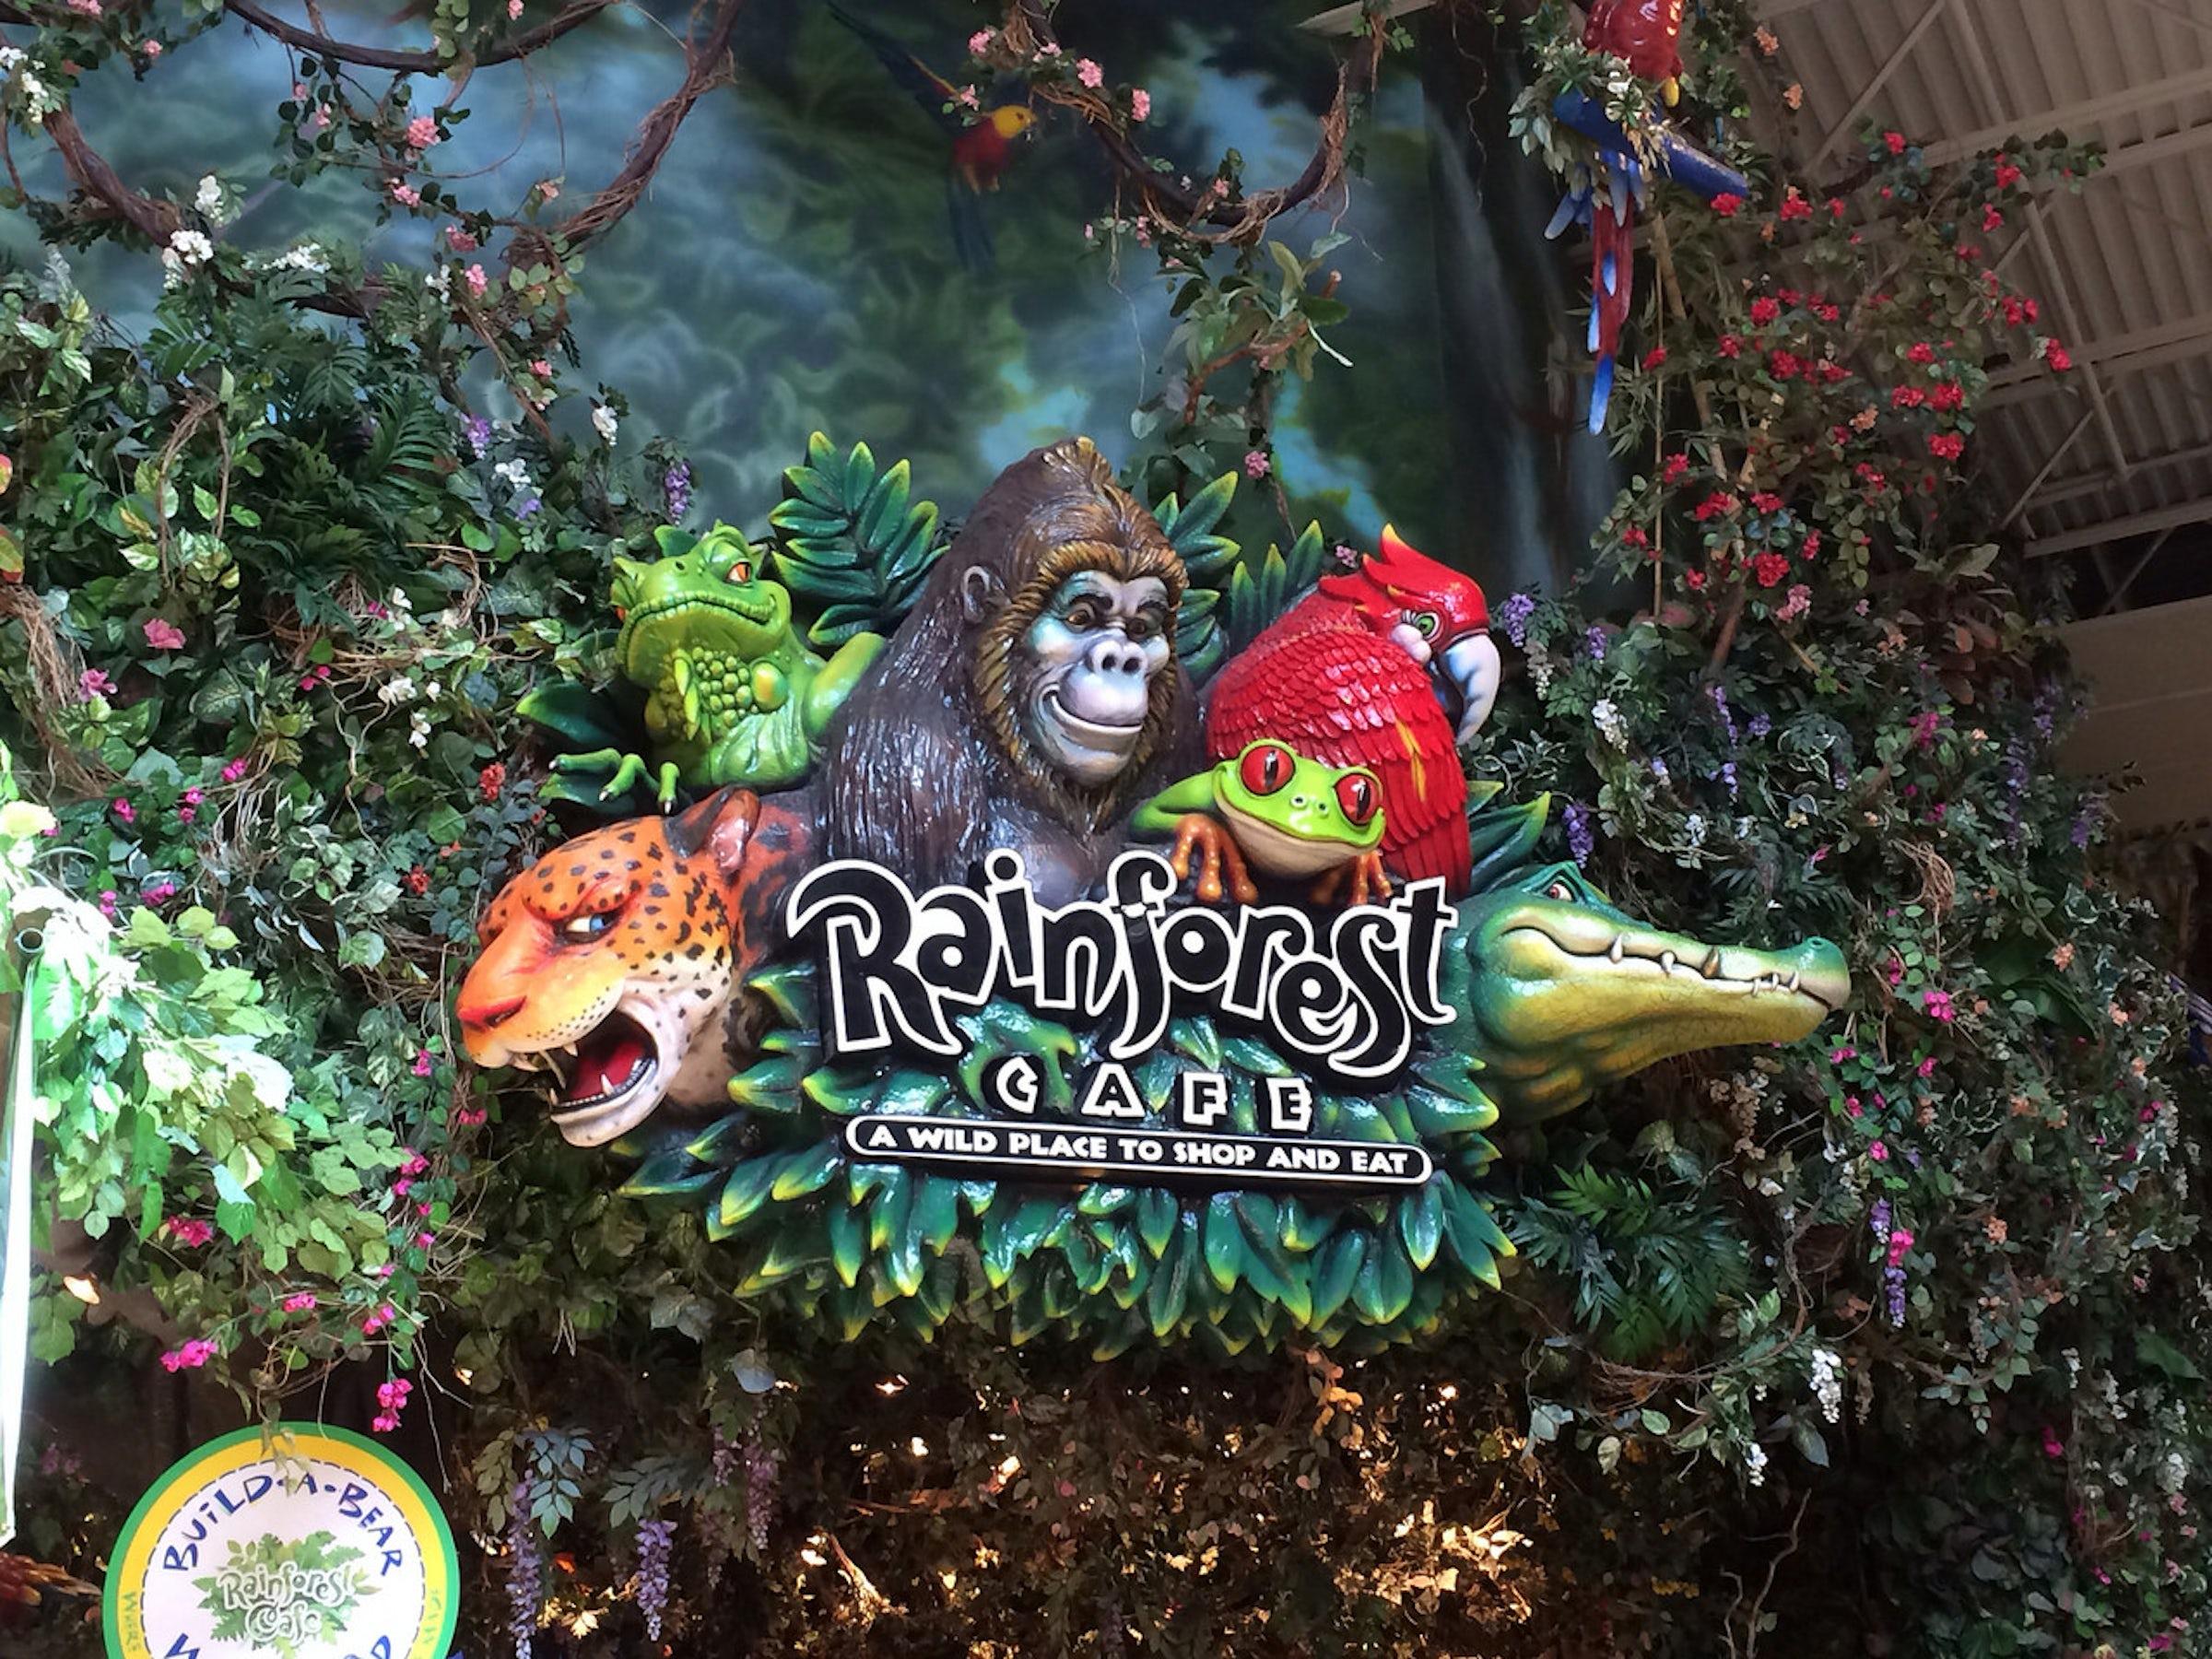 Rainforest Cafe in Beyond Dallas